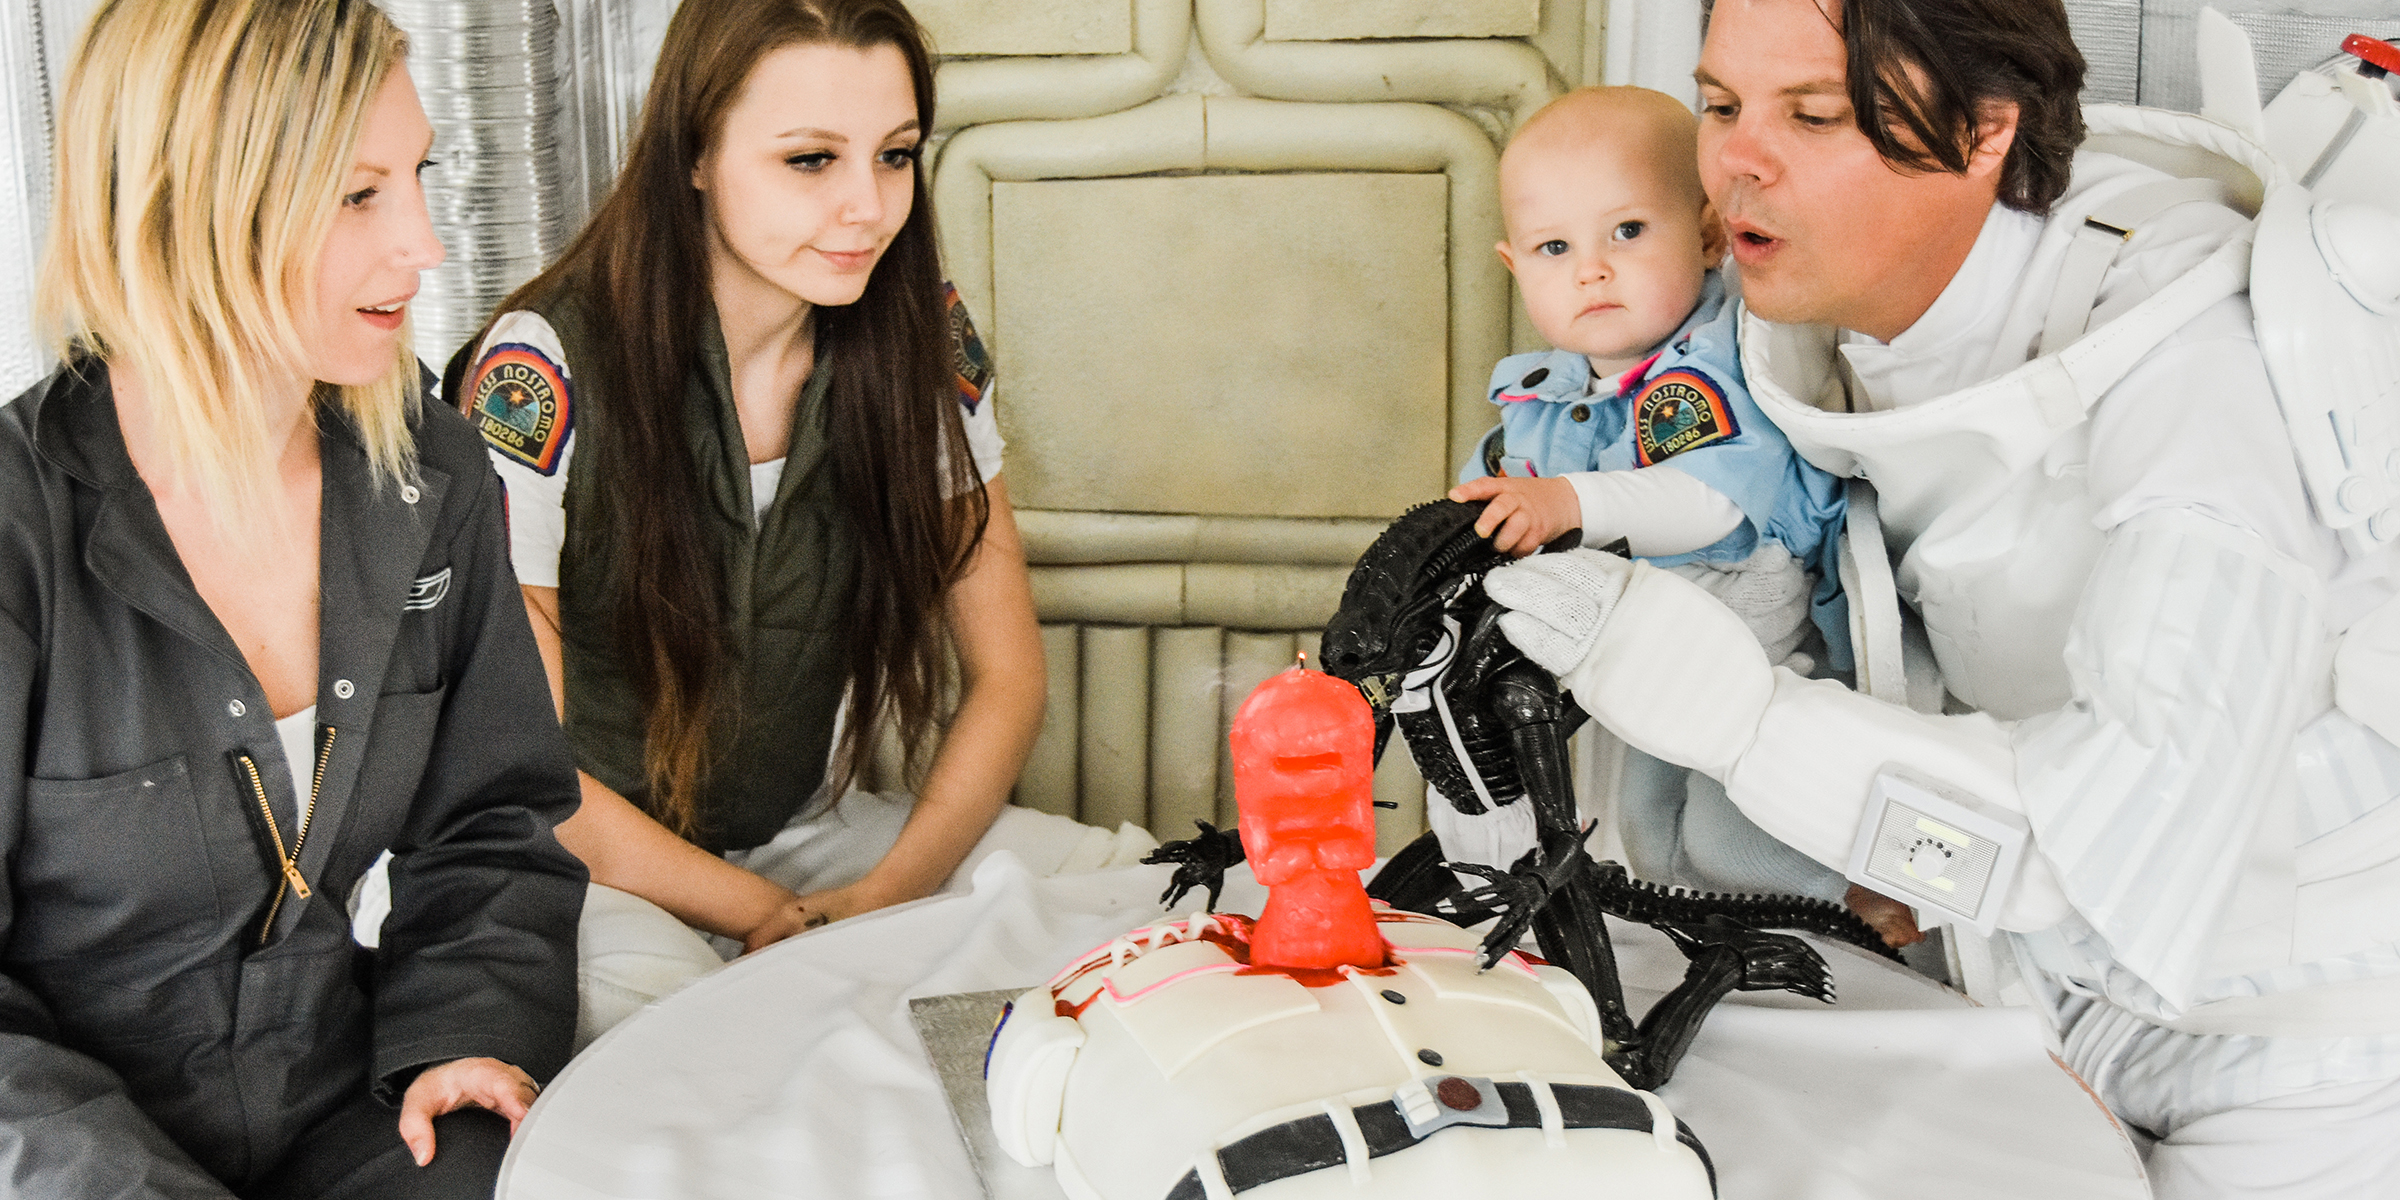 Alien Themed Chestburster Maternity Birthday Photos Wow